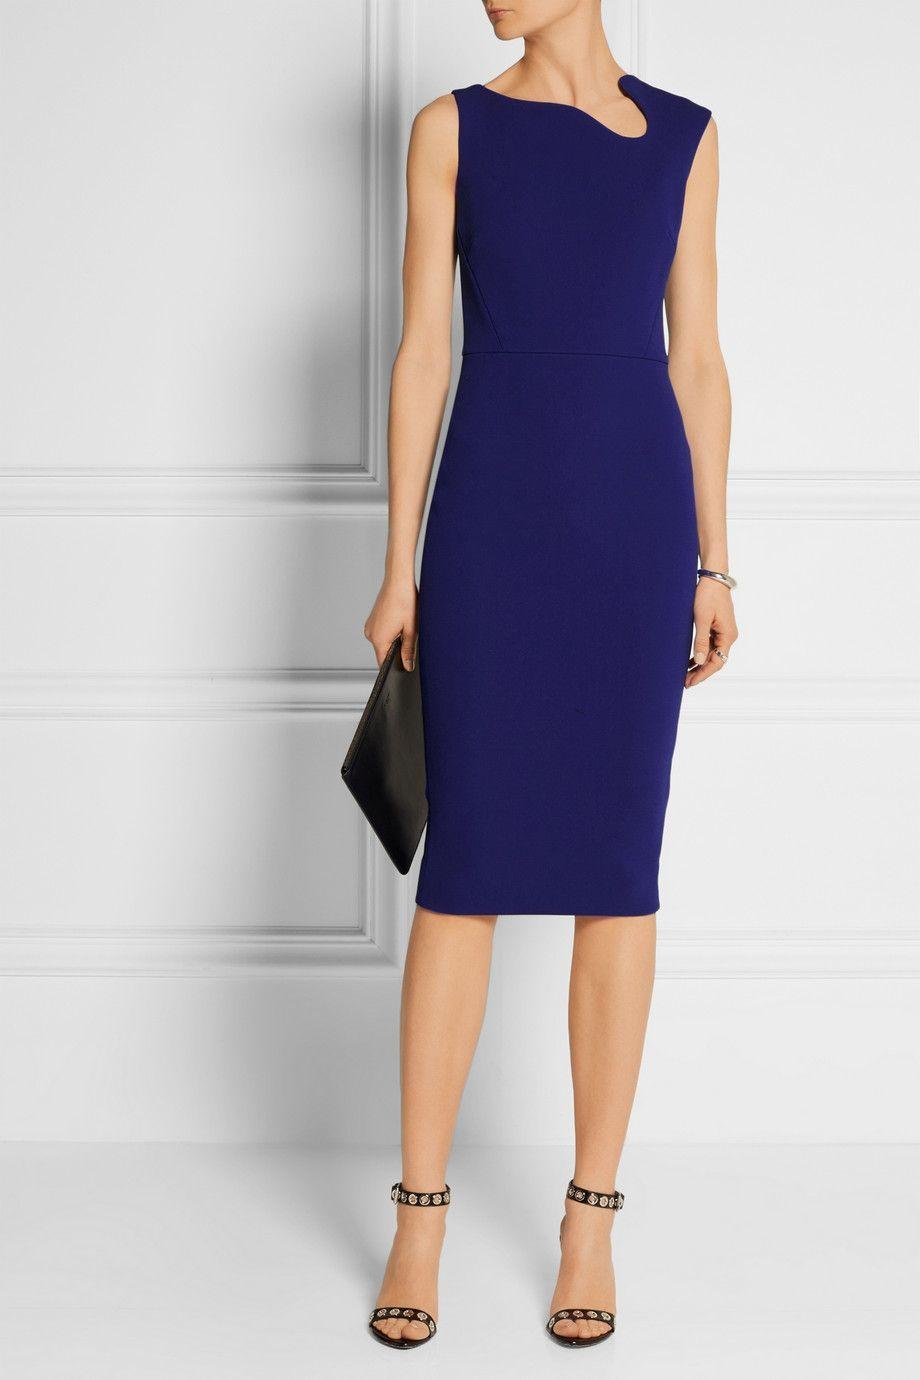 Victoria Beckham Crepe Dress Crepe Dress Victoria Beckham Dress Victoria Dress [ 1380 x 920 Pixel ]